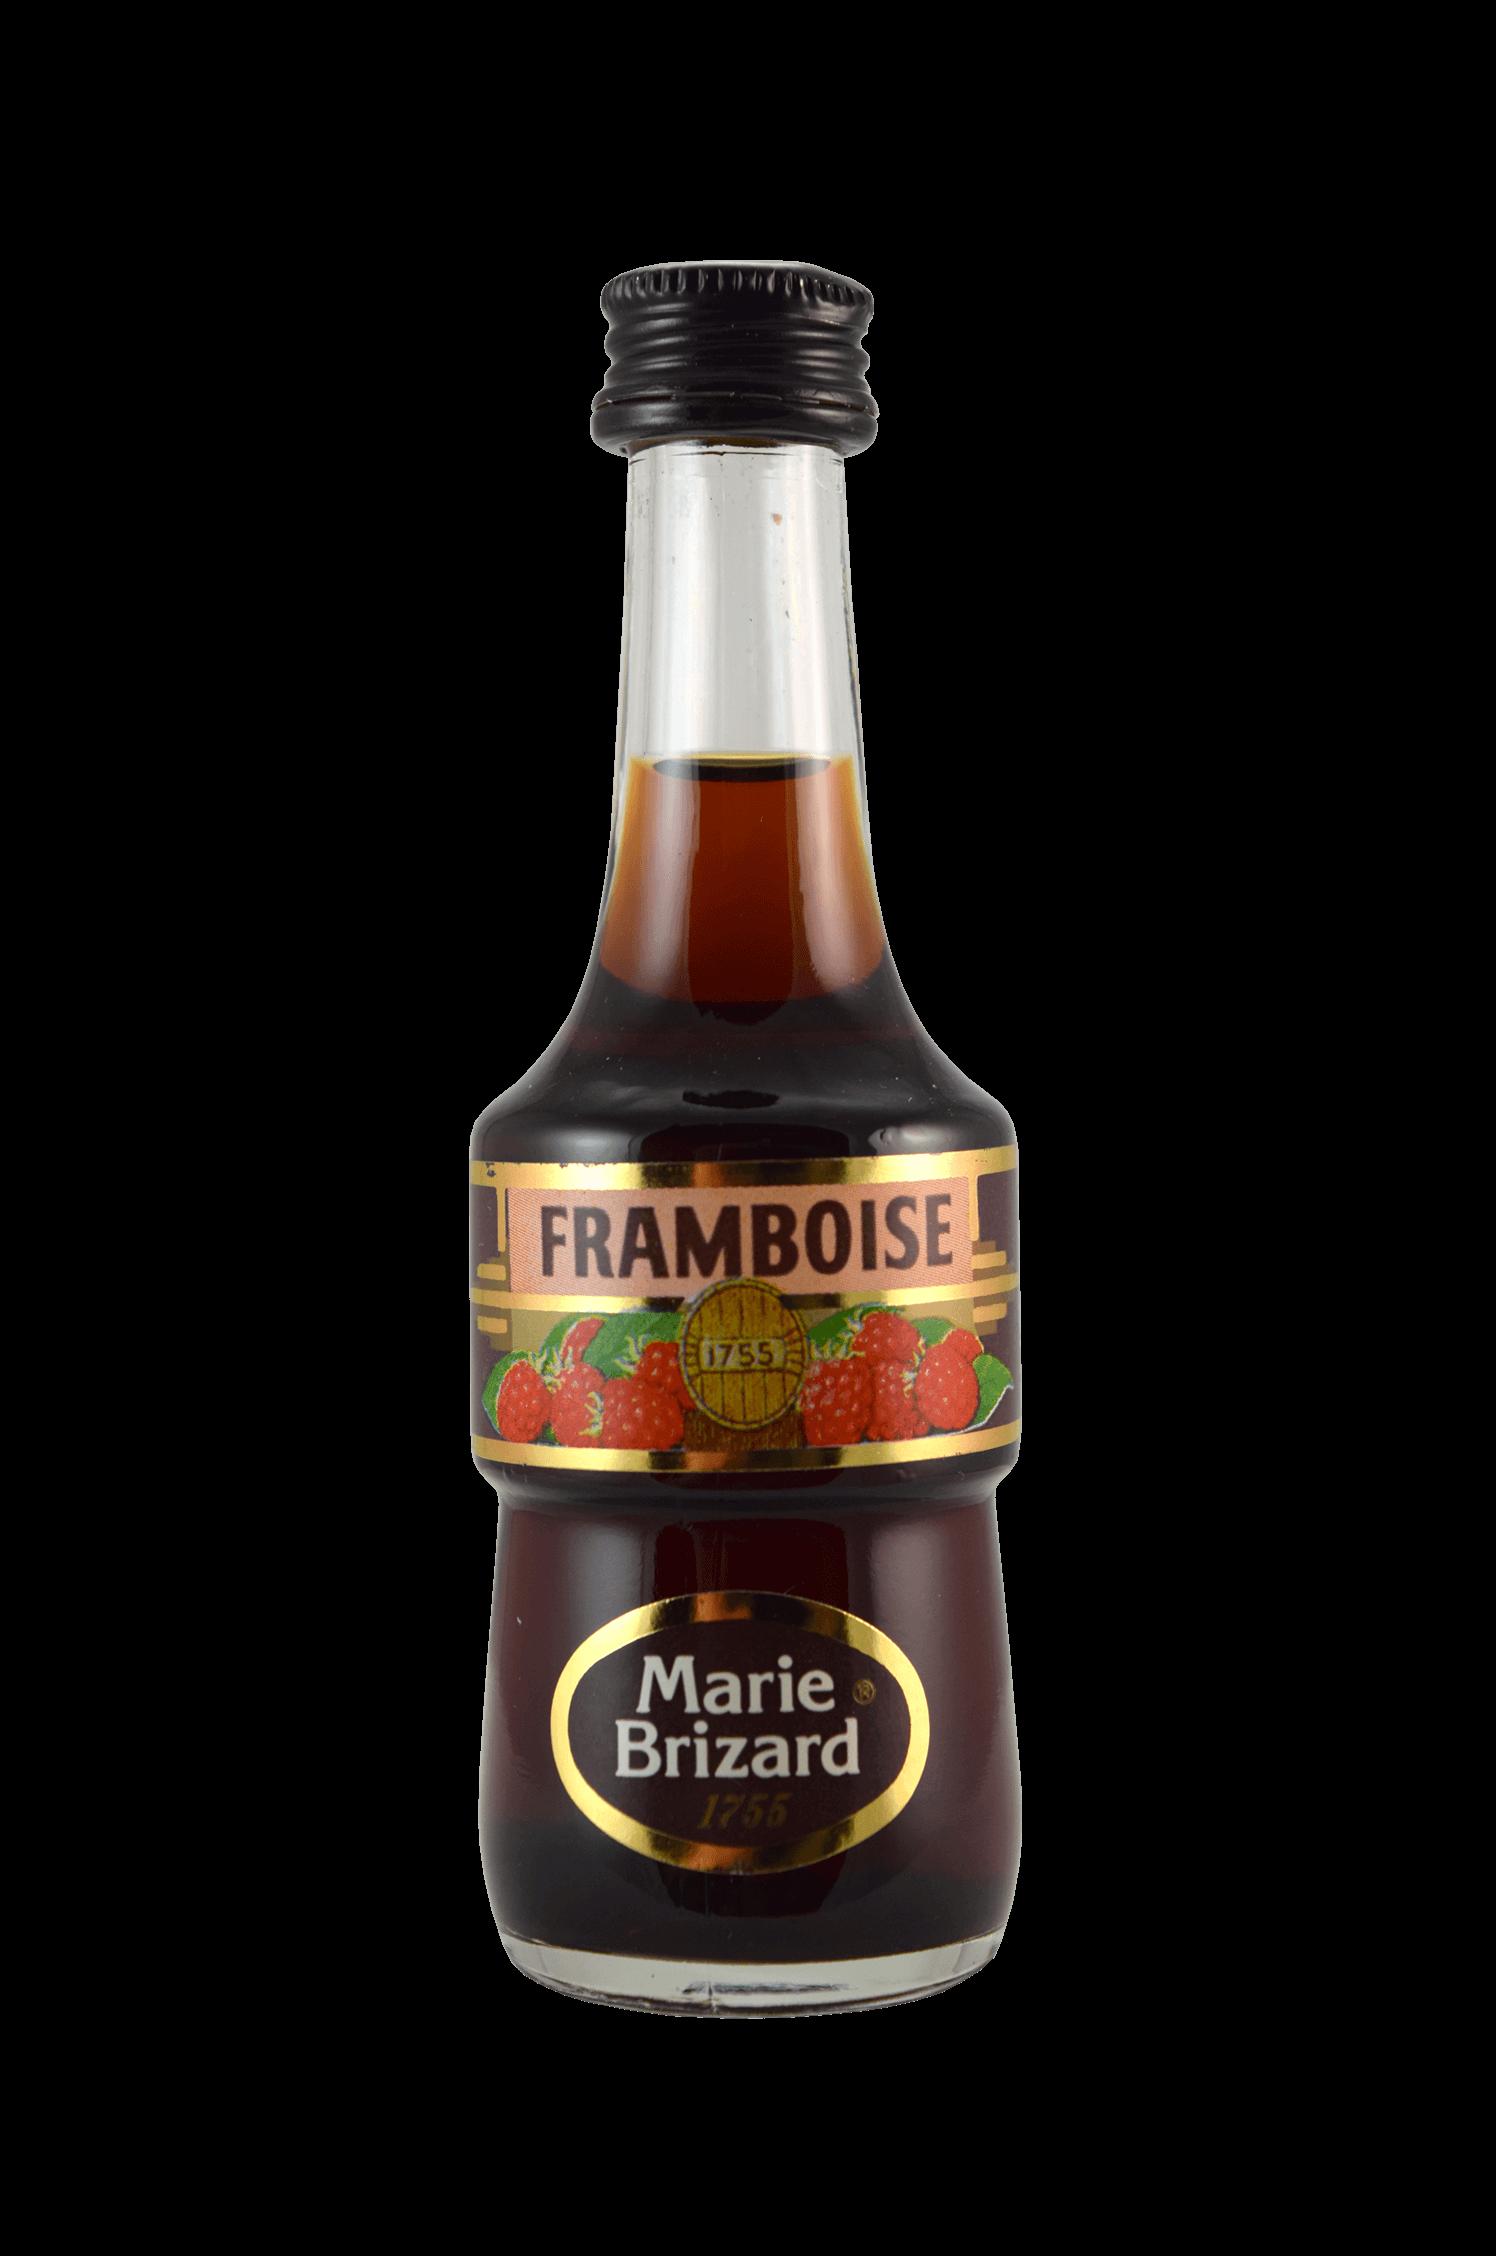 Marie Brizard Framboise